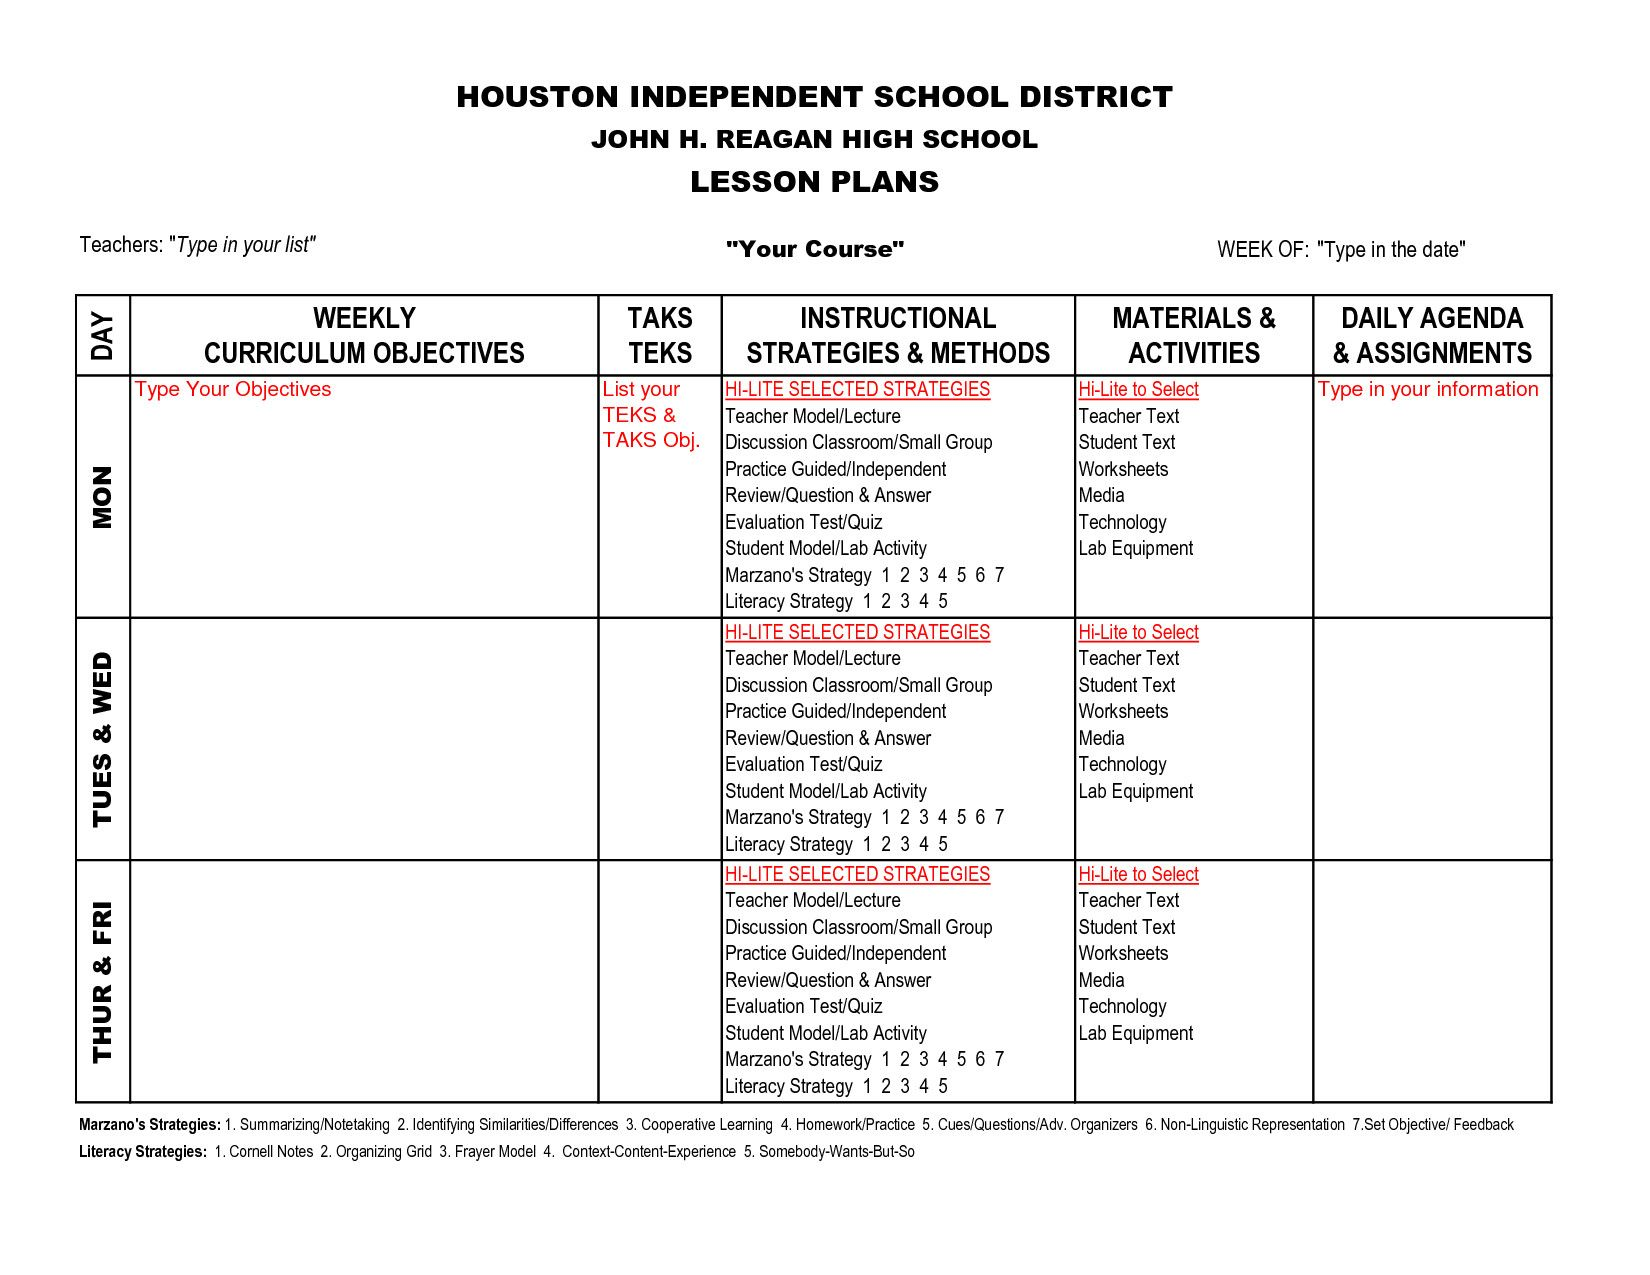 Marzano Lesson Plan Template New Marzano Planning Lesson Pinterest High School Lesson Plans Lesson Plans Template High School High School Science Lesson Plans